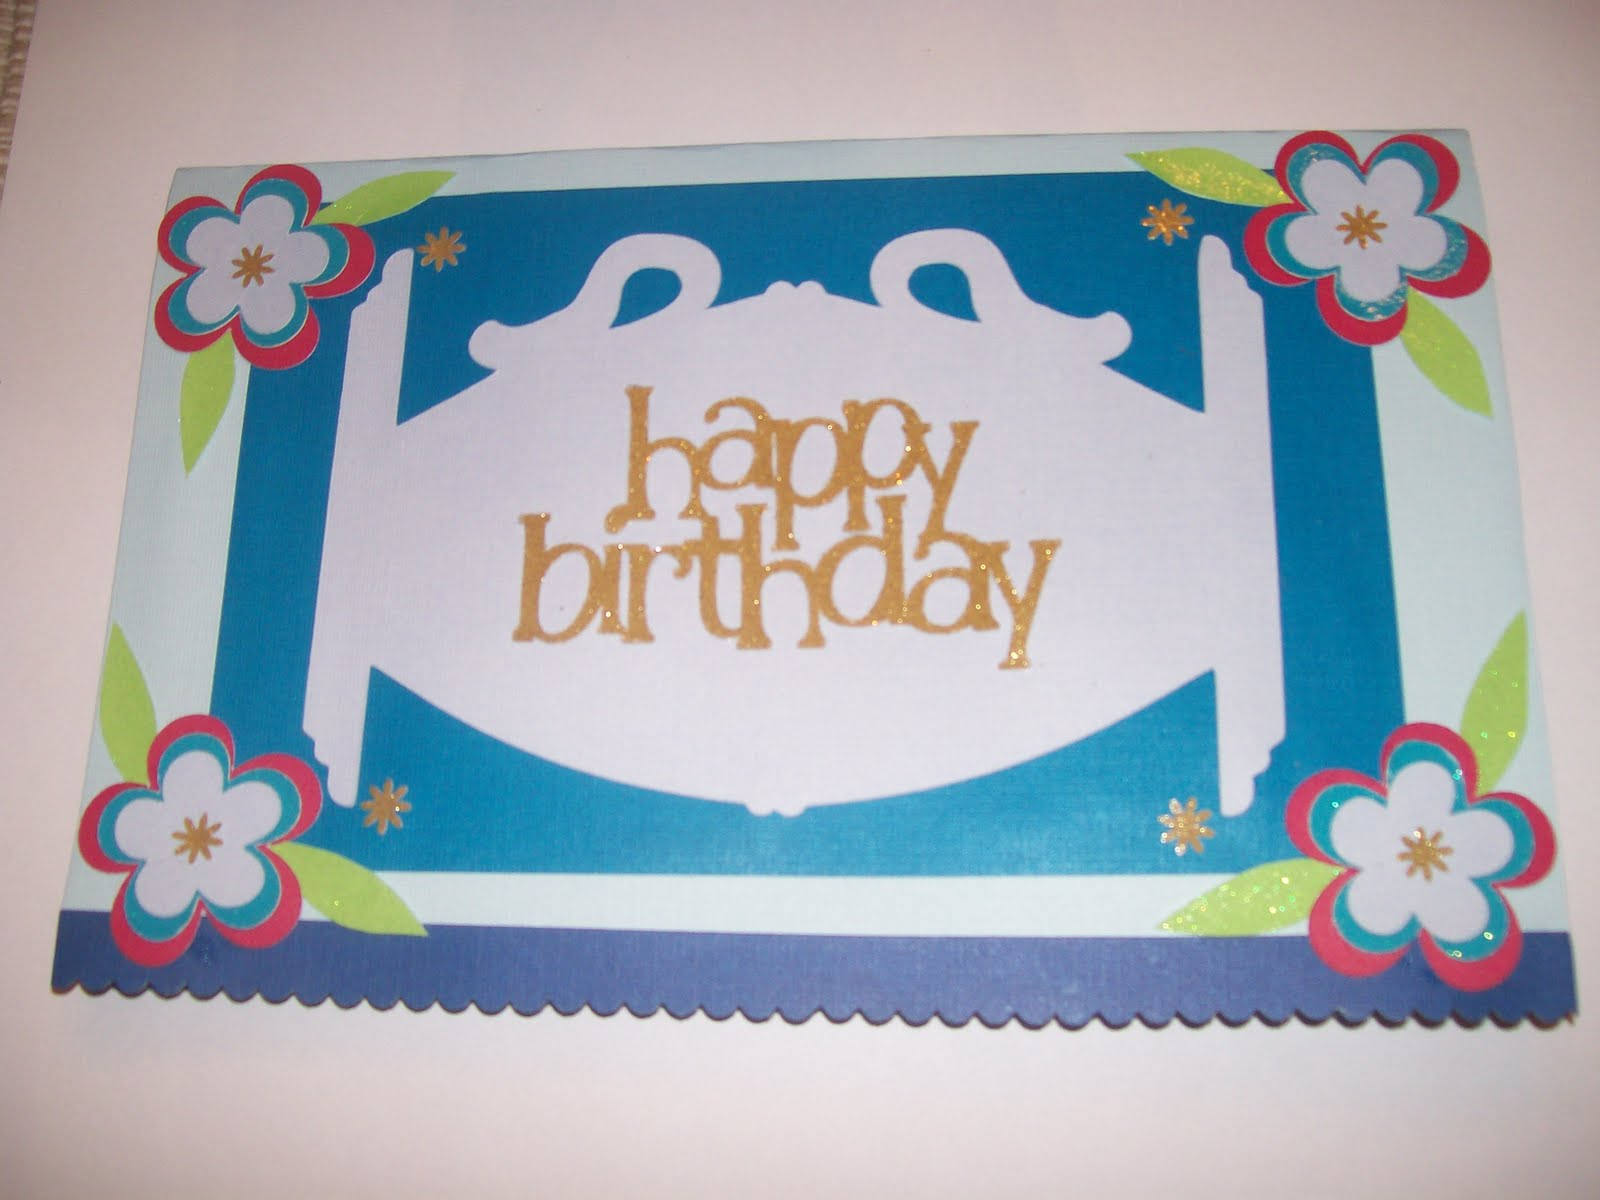 Beautiful homemade birthday cards pictures eccleshallfc ayesha s handmade cards birthday card bookmarktalkfo Choice Image